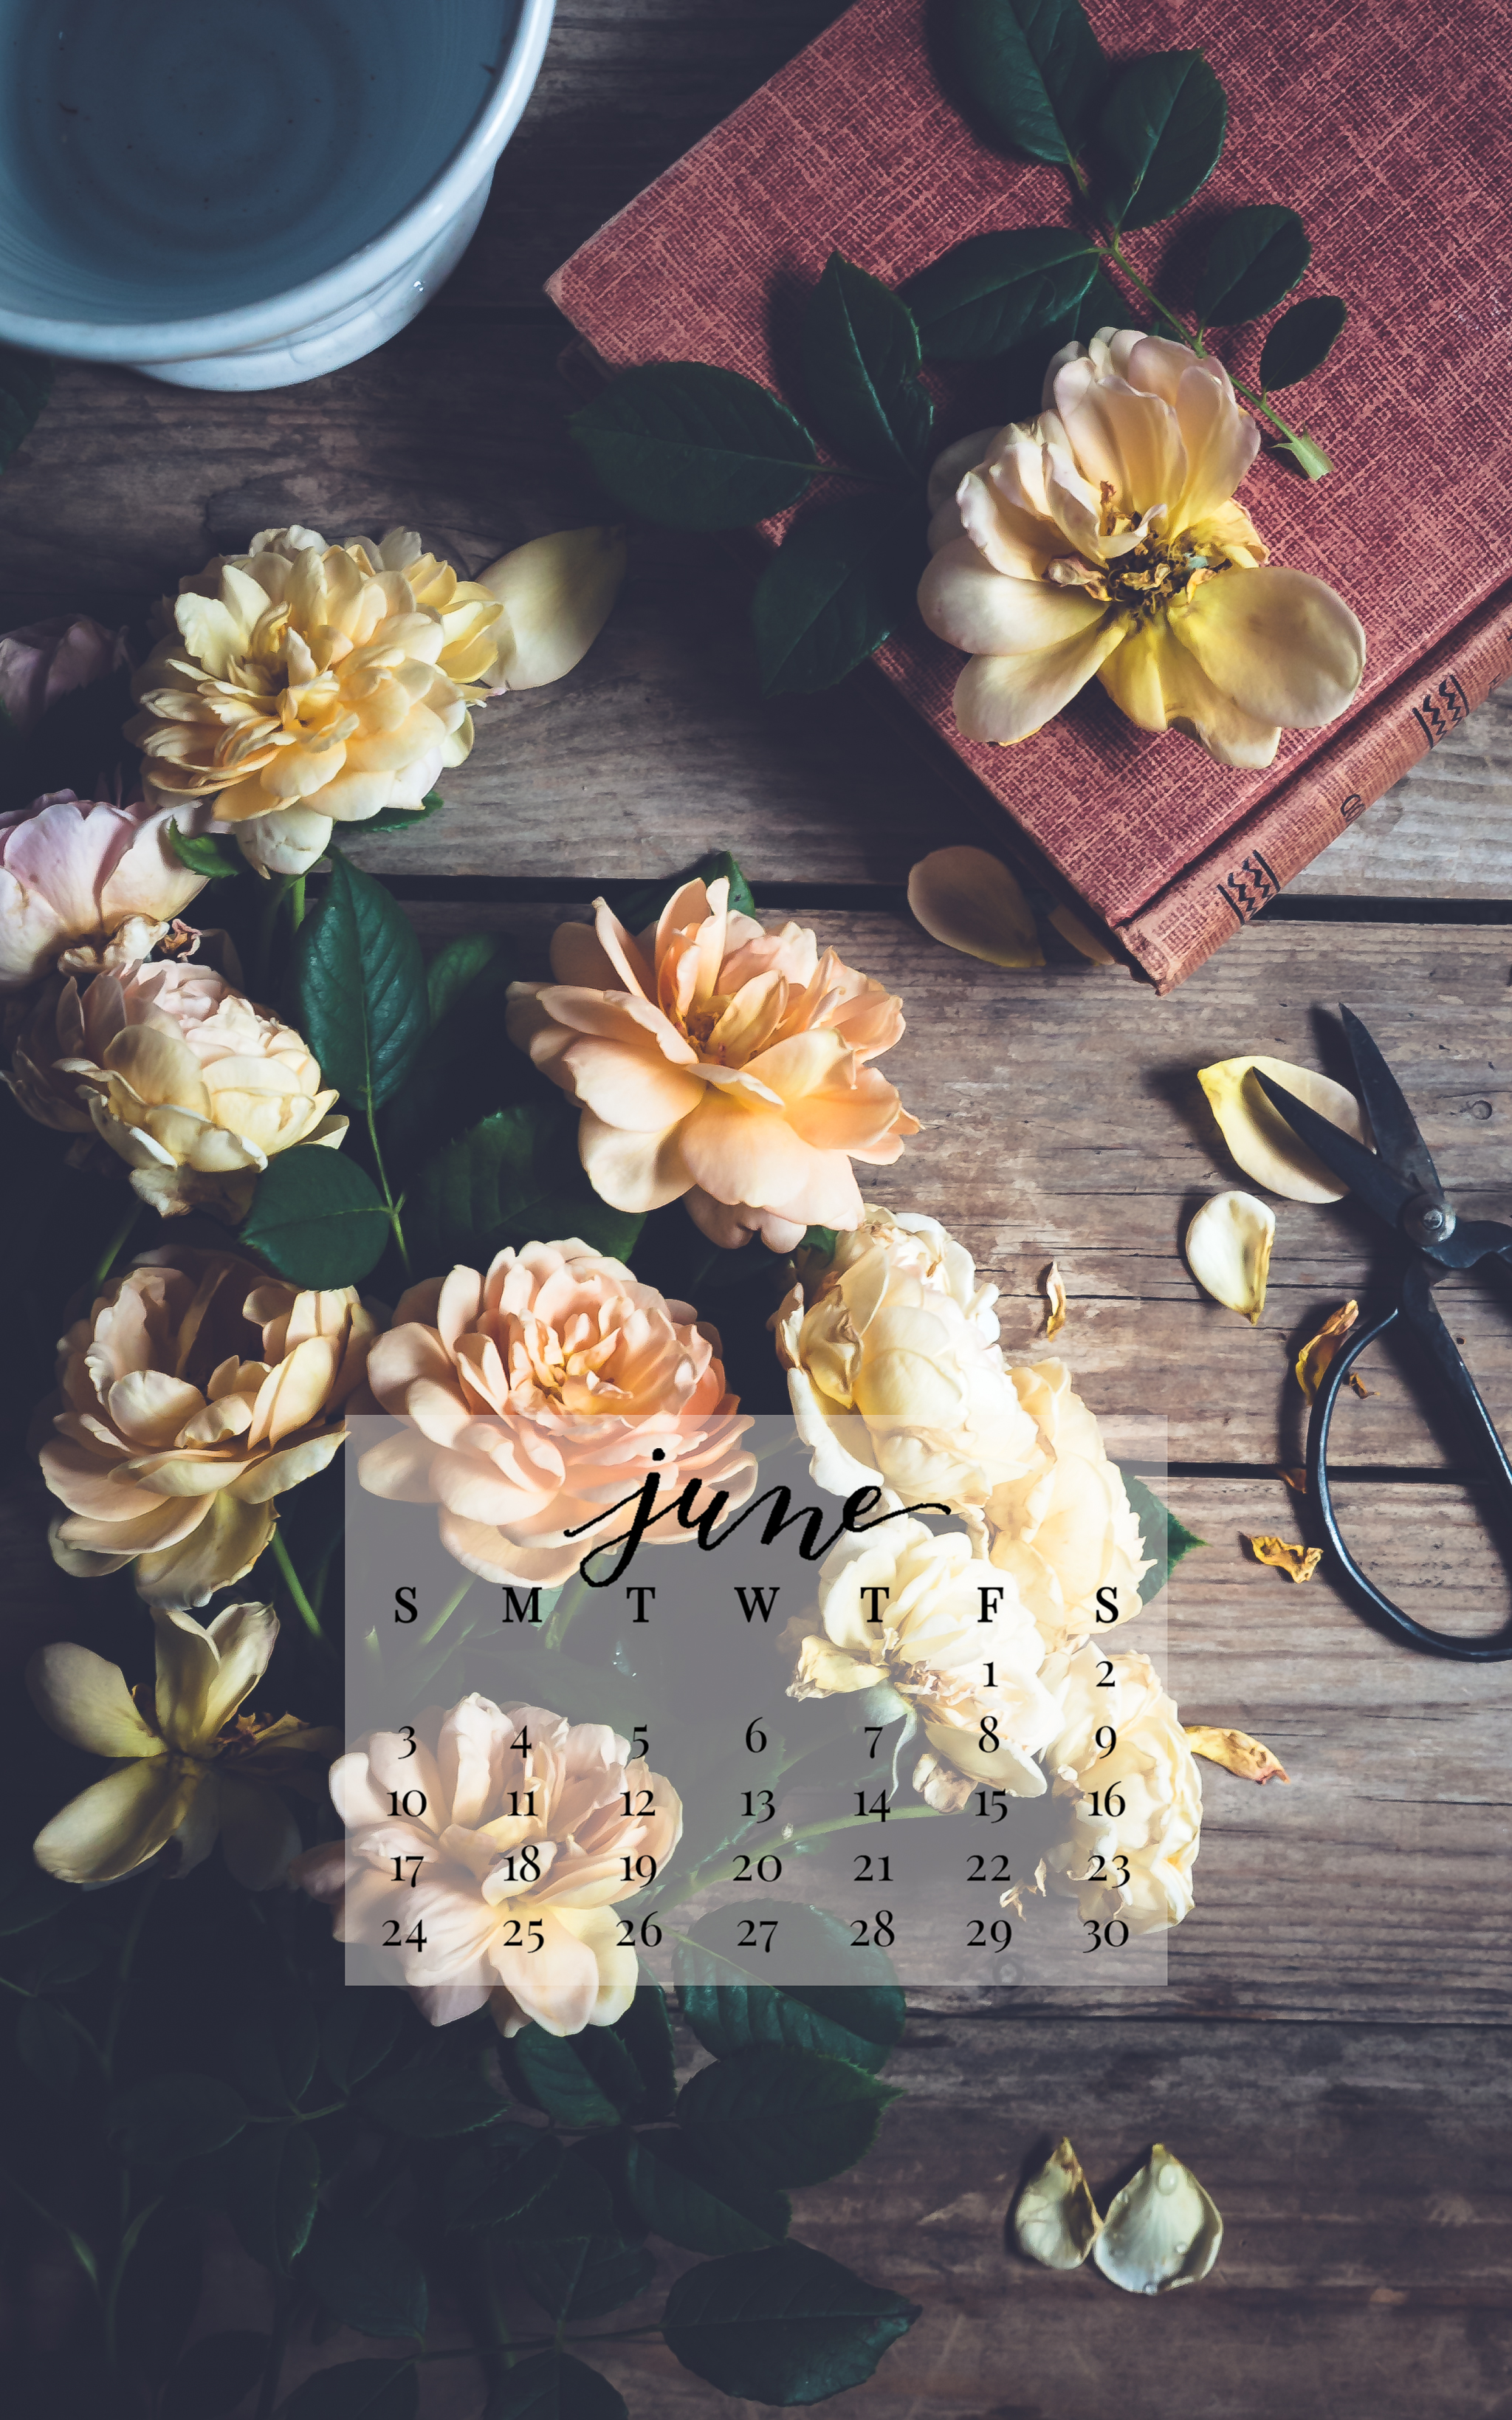 June 2018 Device Calendar